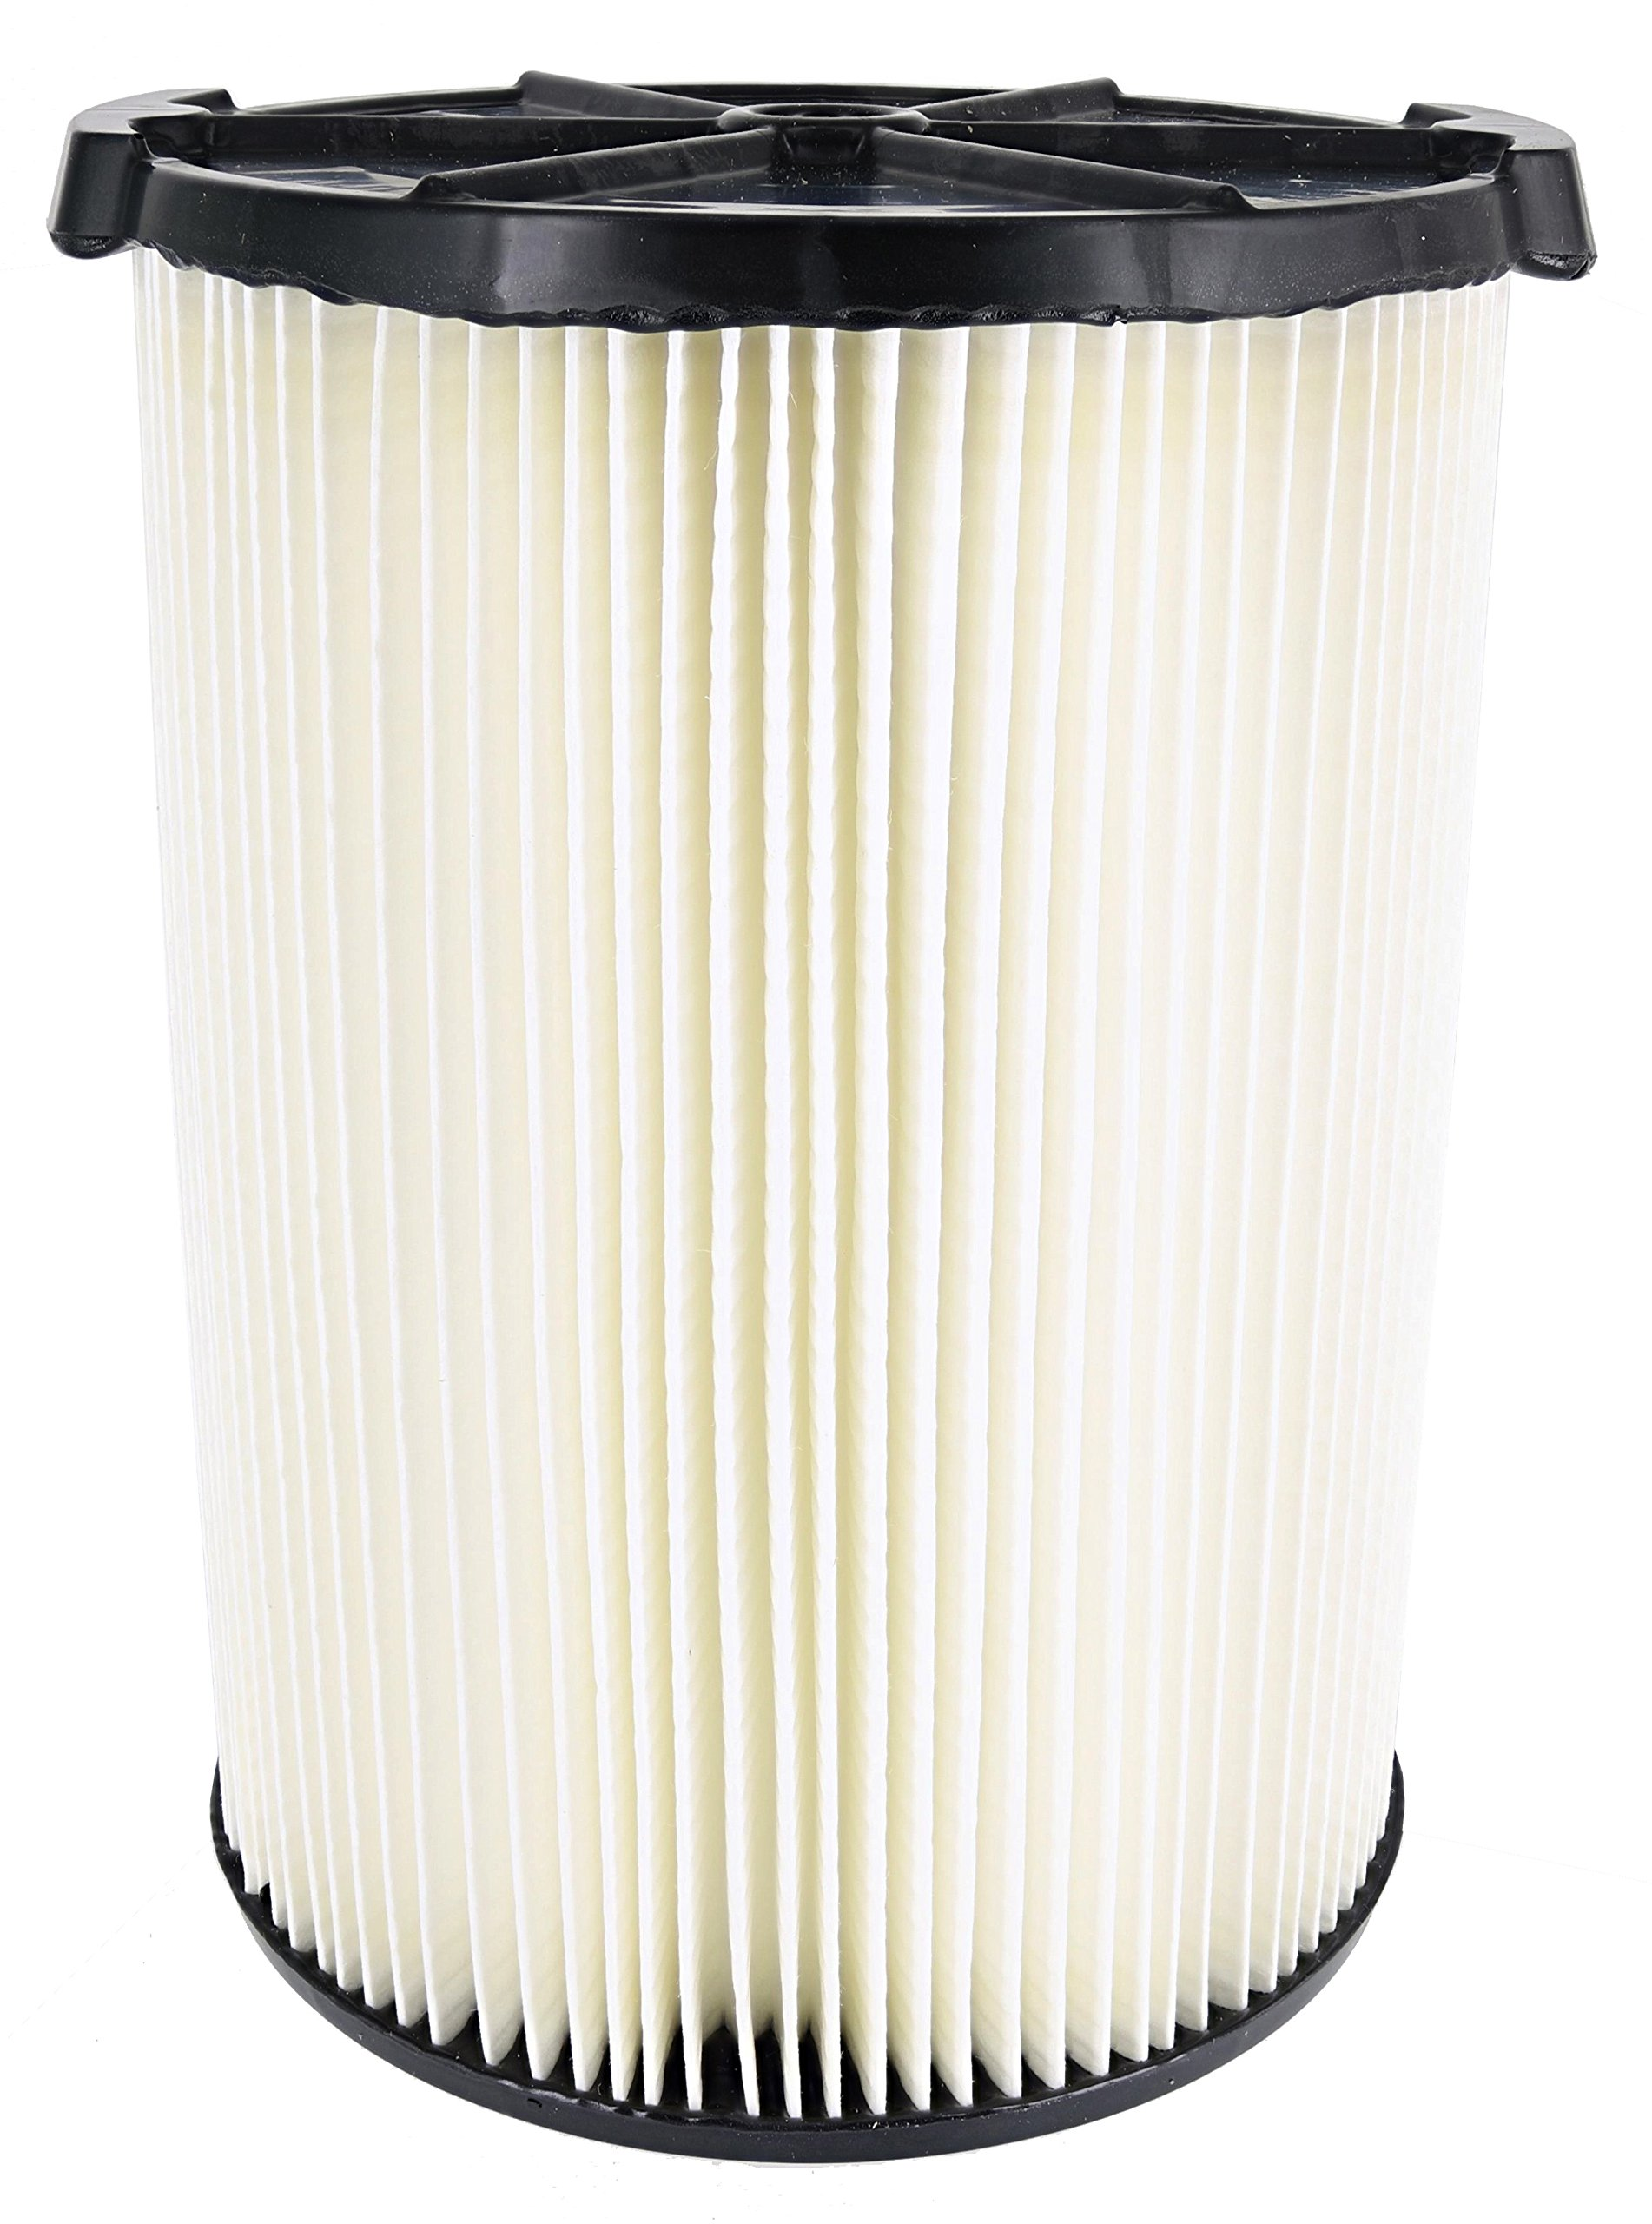 Ridgid Standard Wet/dry Vac Filter Vf4000 (White, 1) (Original Version) by Ridgid